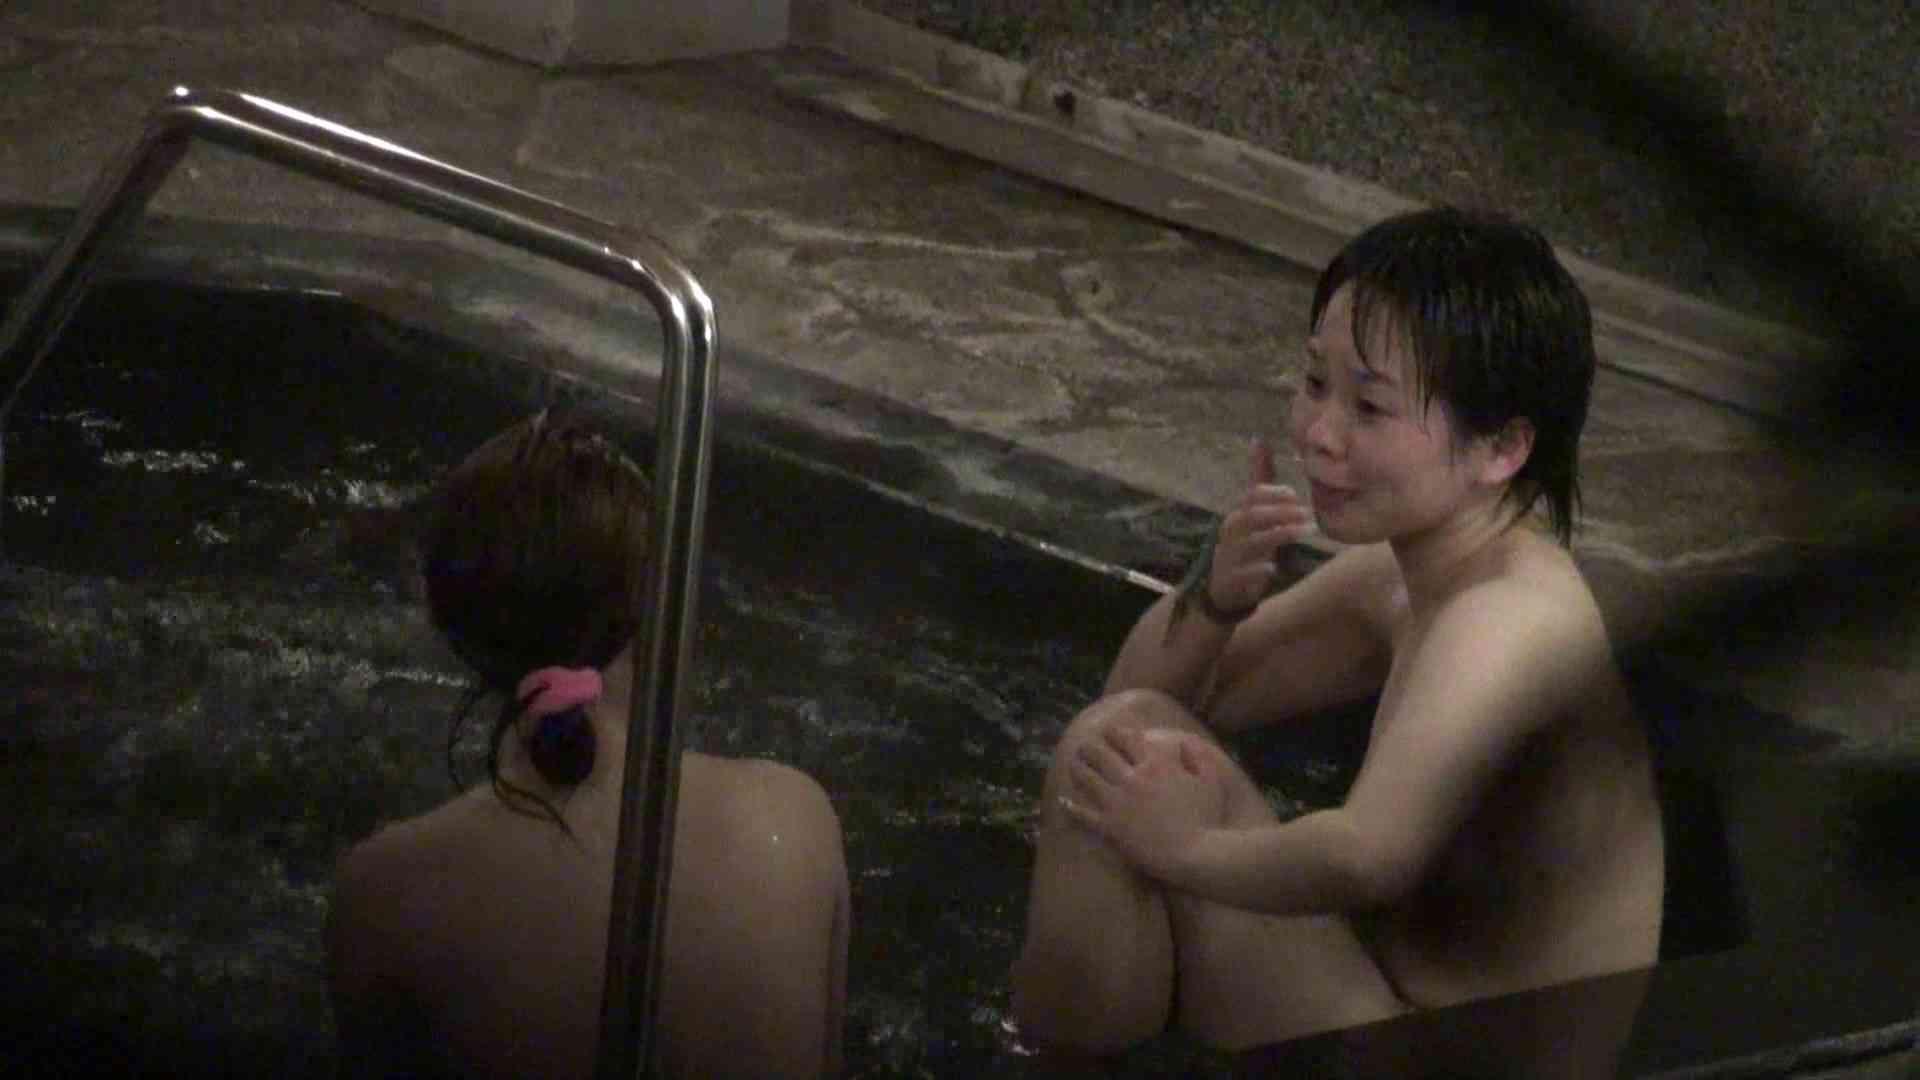 Aquaな露天風呂Vol.394 盗撮 | OLセックス  99画像 97